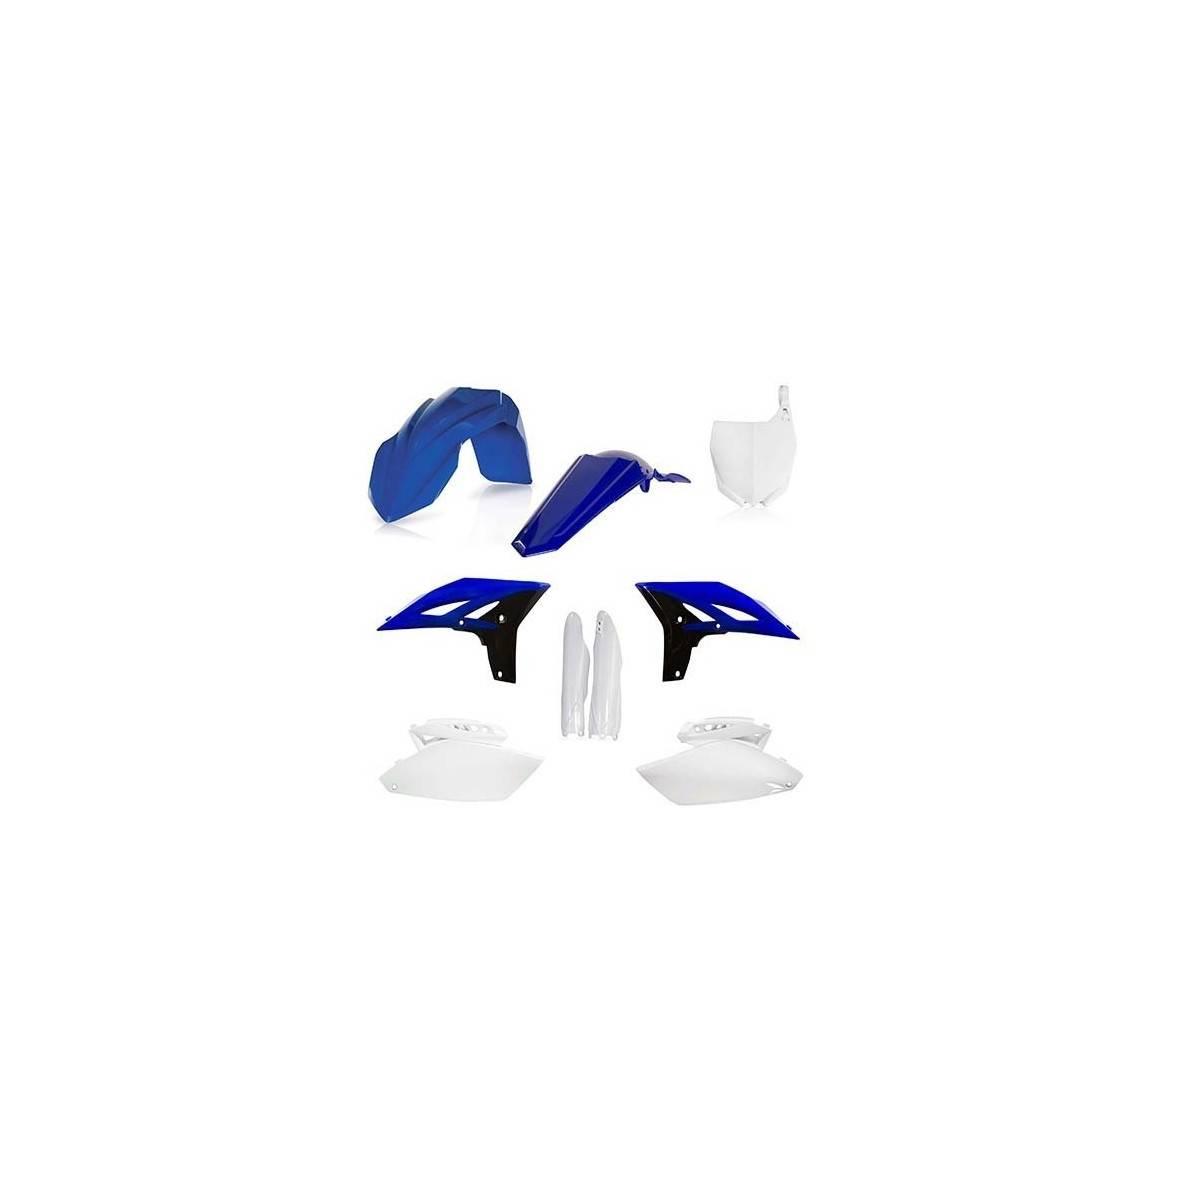 0023085-553 - Full Kit Plasticos Yz 250 18 Origen